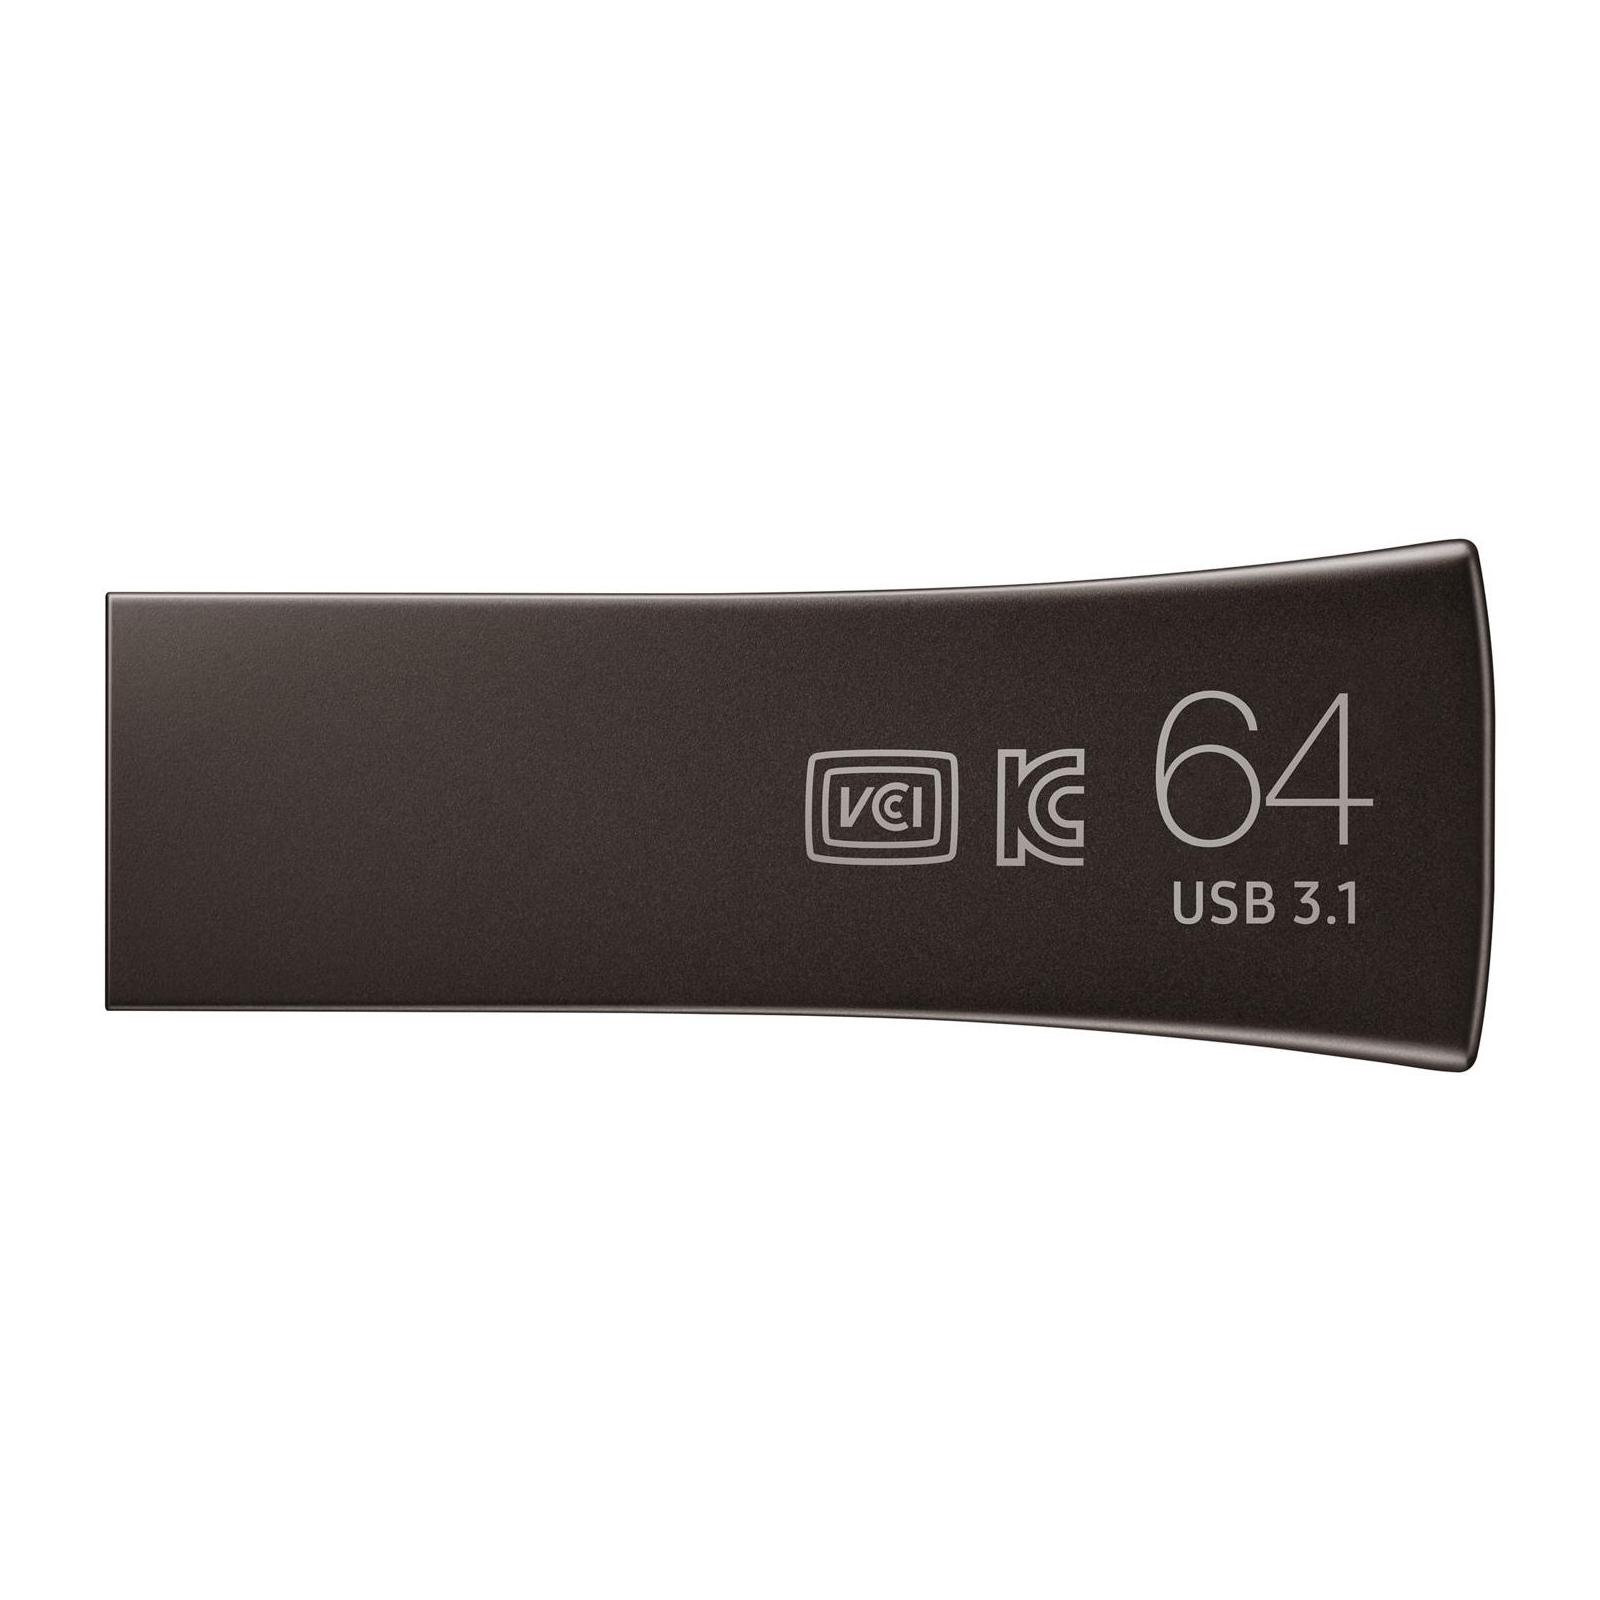 USB флеш накопитель Samsung 32GB Bar Plus Black USB 3.1 (MUF-32BE4/APC) изображение 2